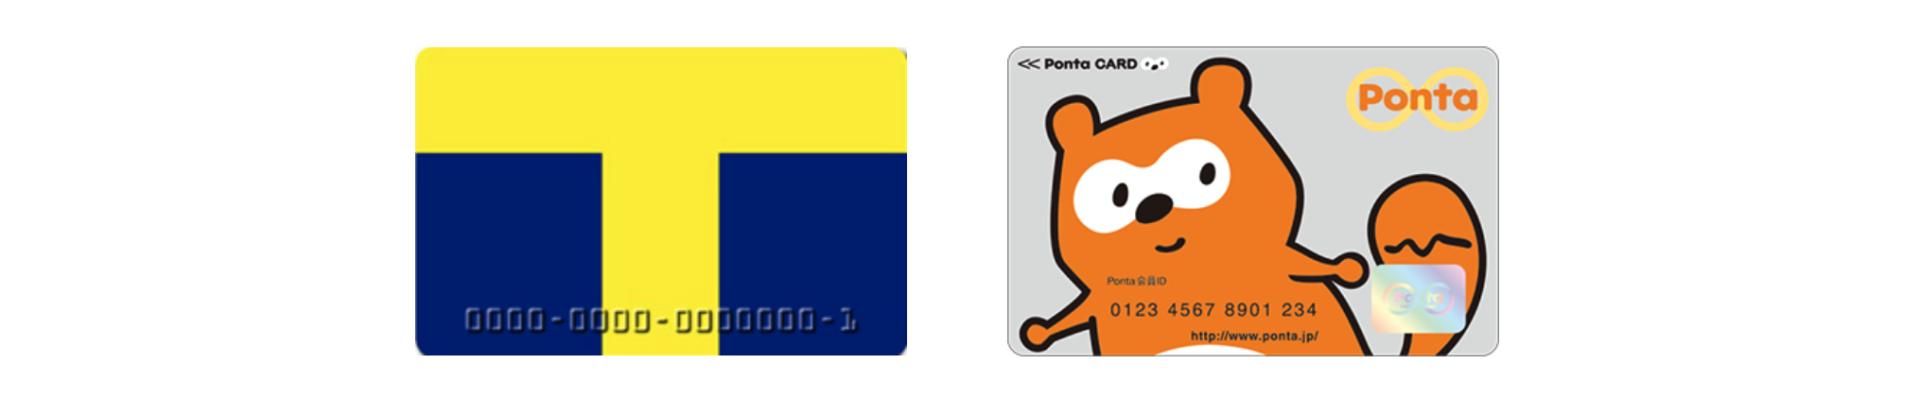 Tポイントカードとポンタカード